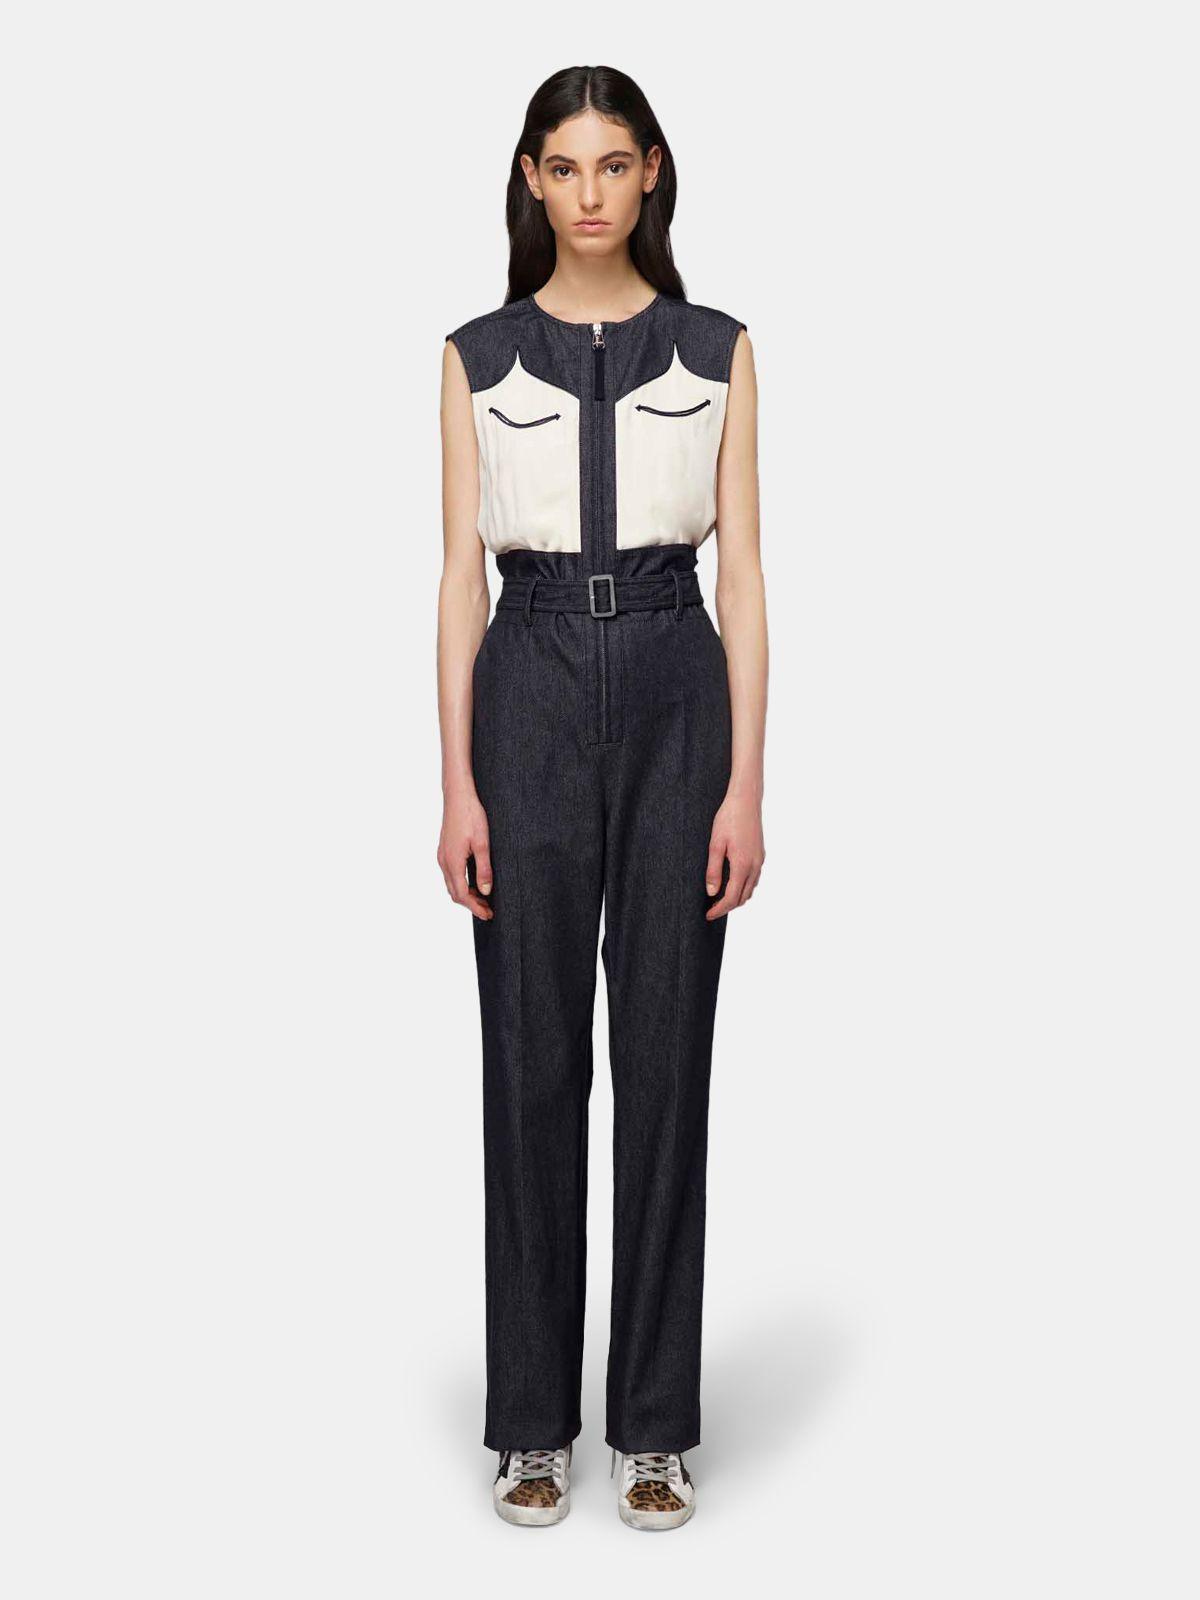 Golden Goose - Jocelyn jumpsuit in tailoring denim in